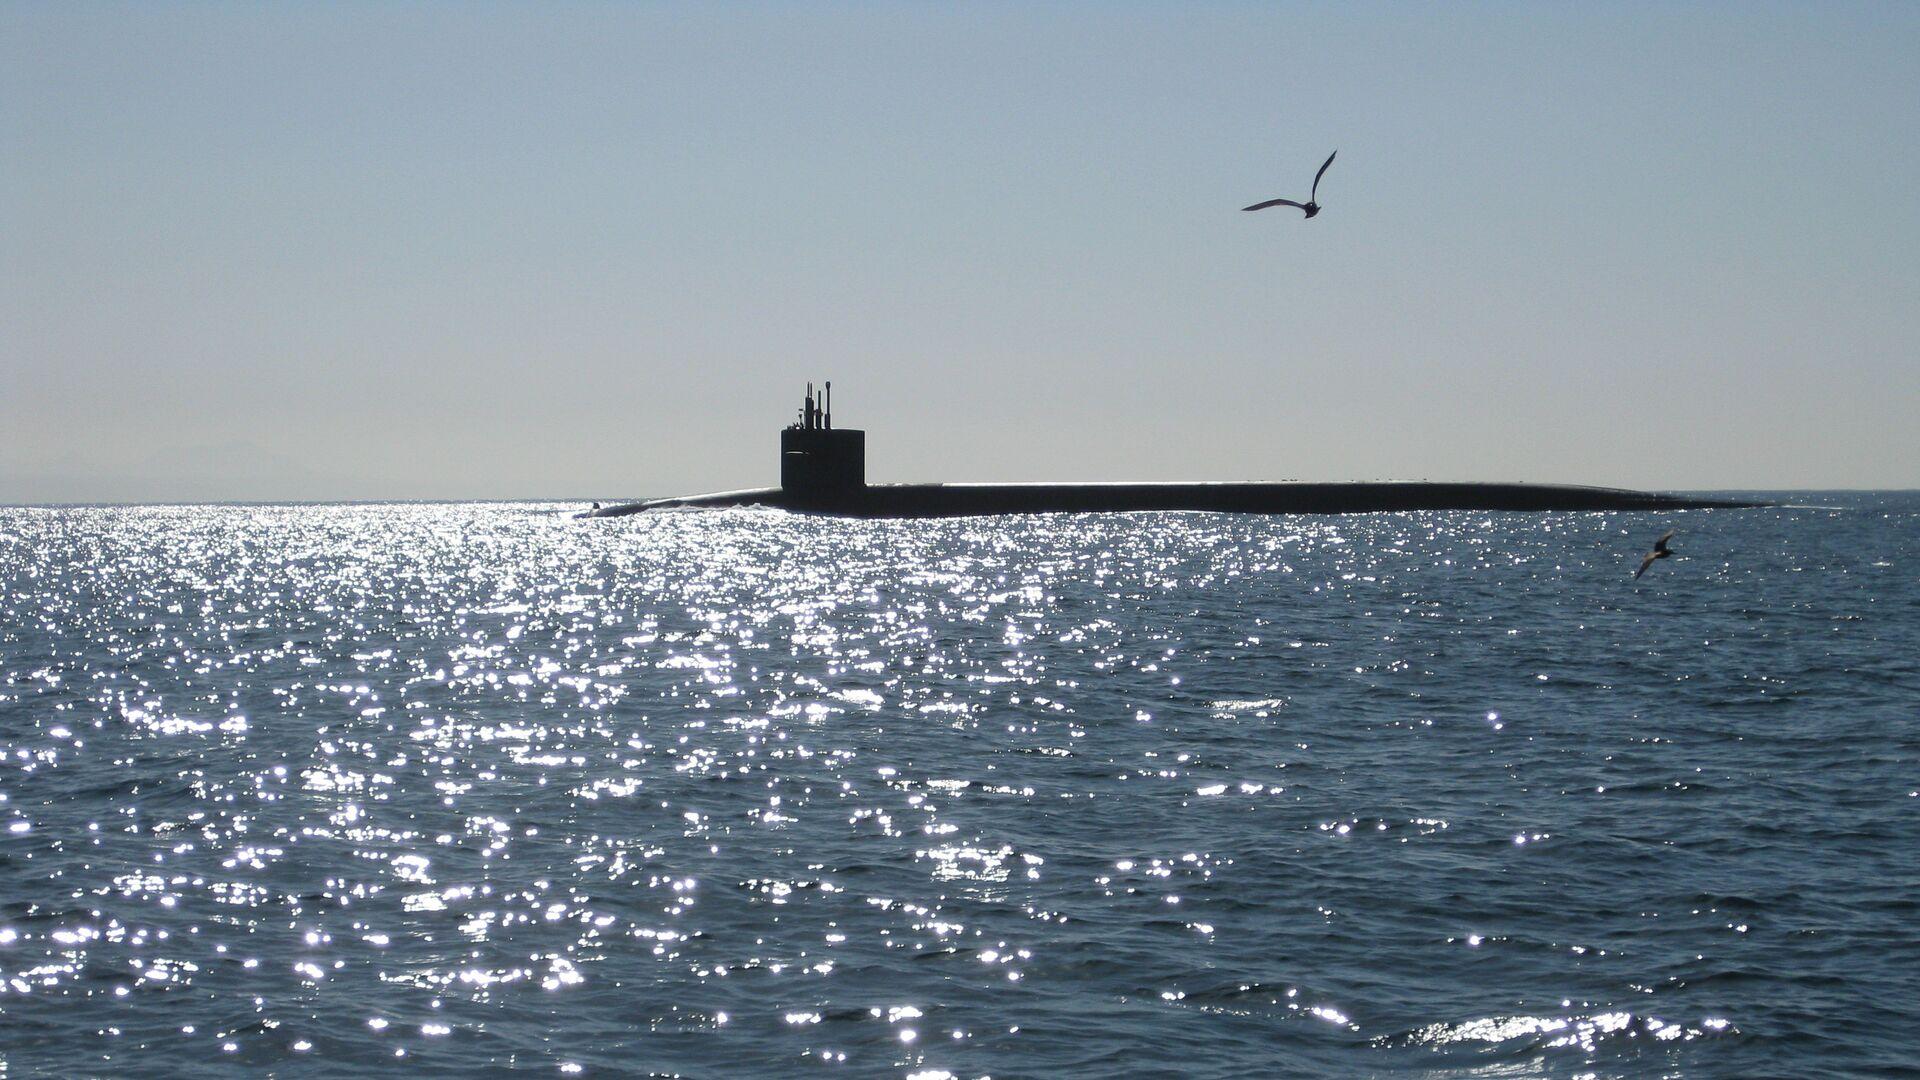 Un submarino (imagen referencial) - Sputnik Mundo, 1920, 16.09.2021